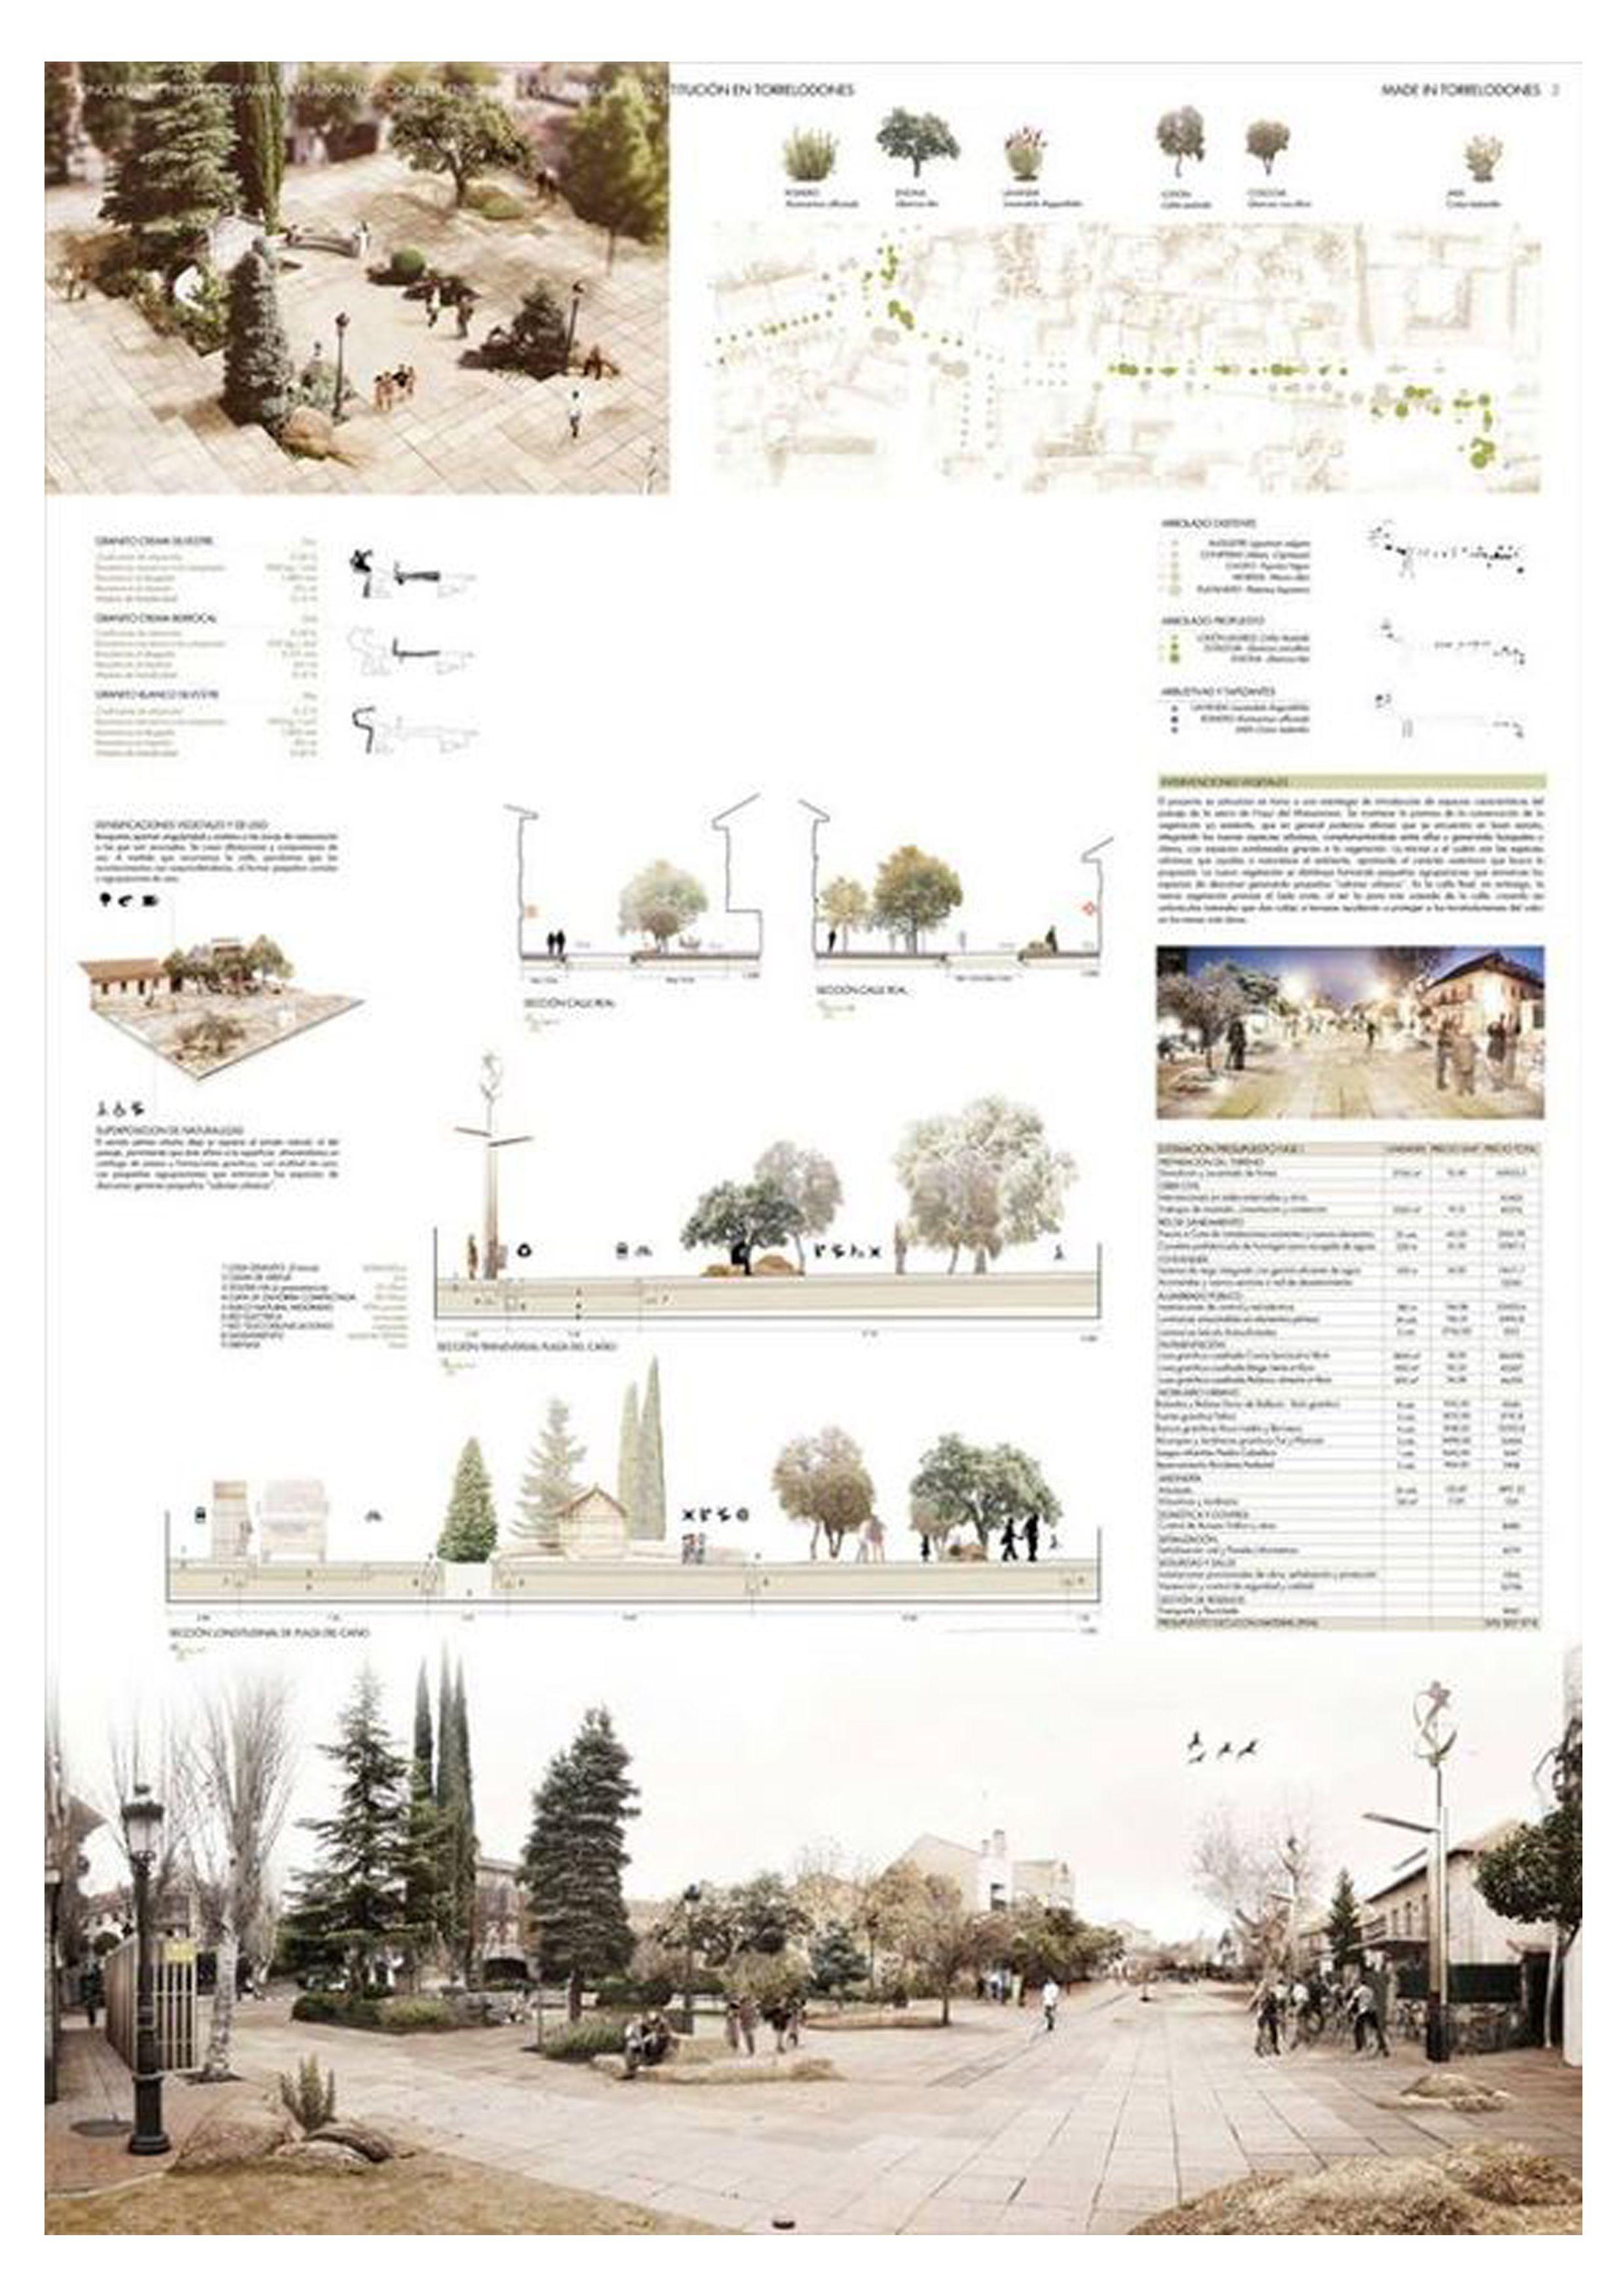 Pin de Erin Rodríguez De Pipicano en Diseño Urbano | Pinterest ...